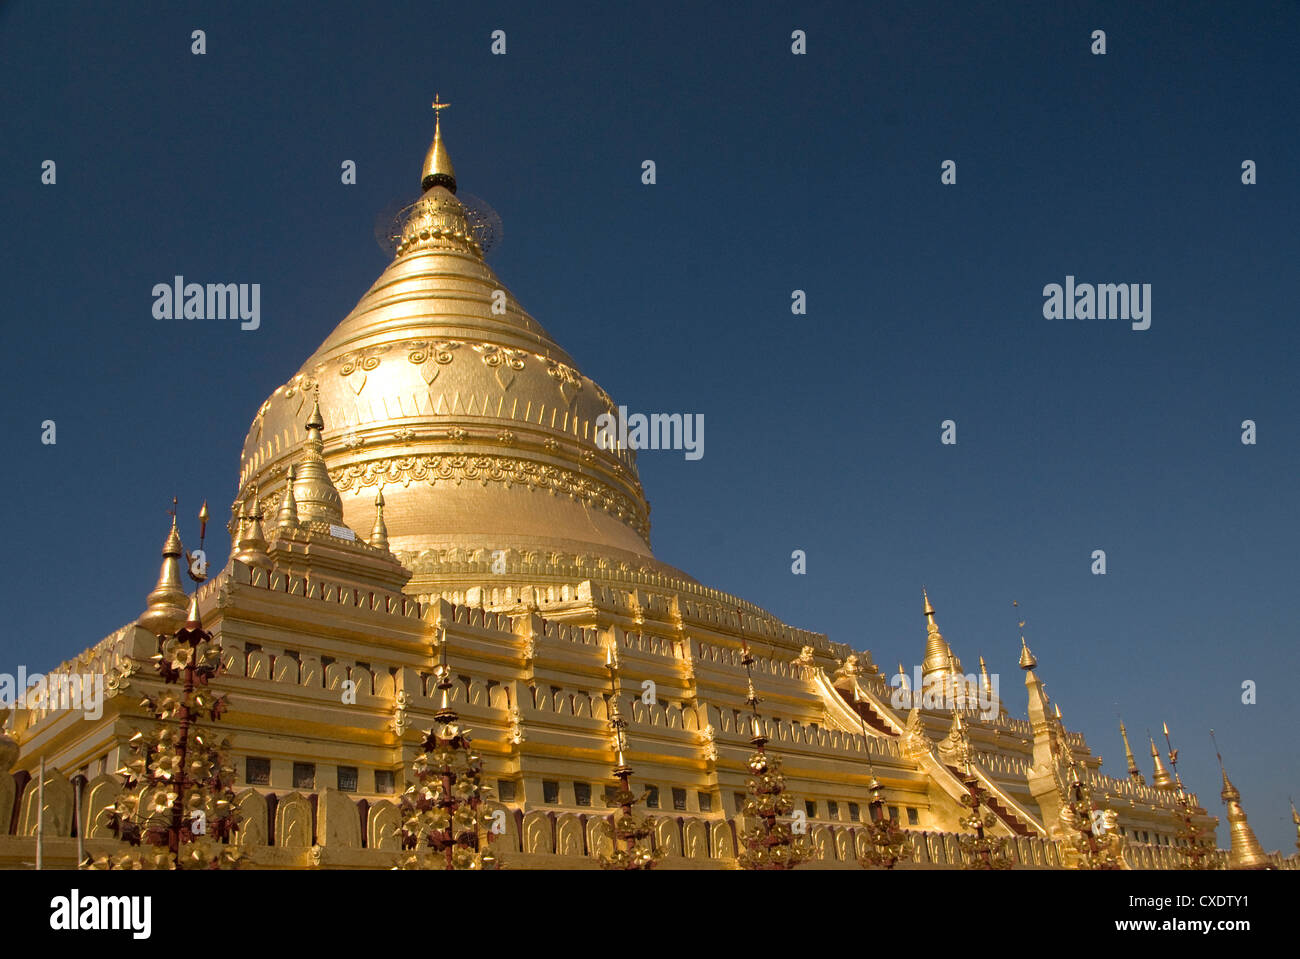 Shwezigon Paya, Bagan (Pagan), Myanmar (Burma), Asia Stock Photo